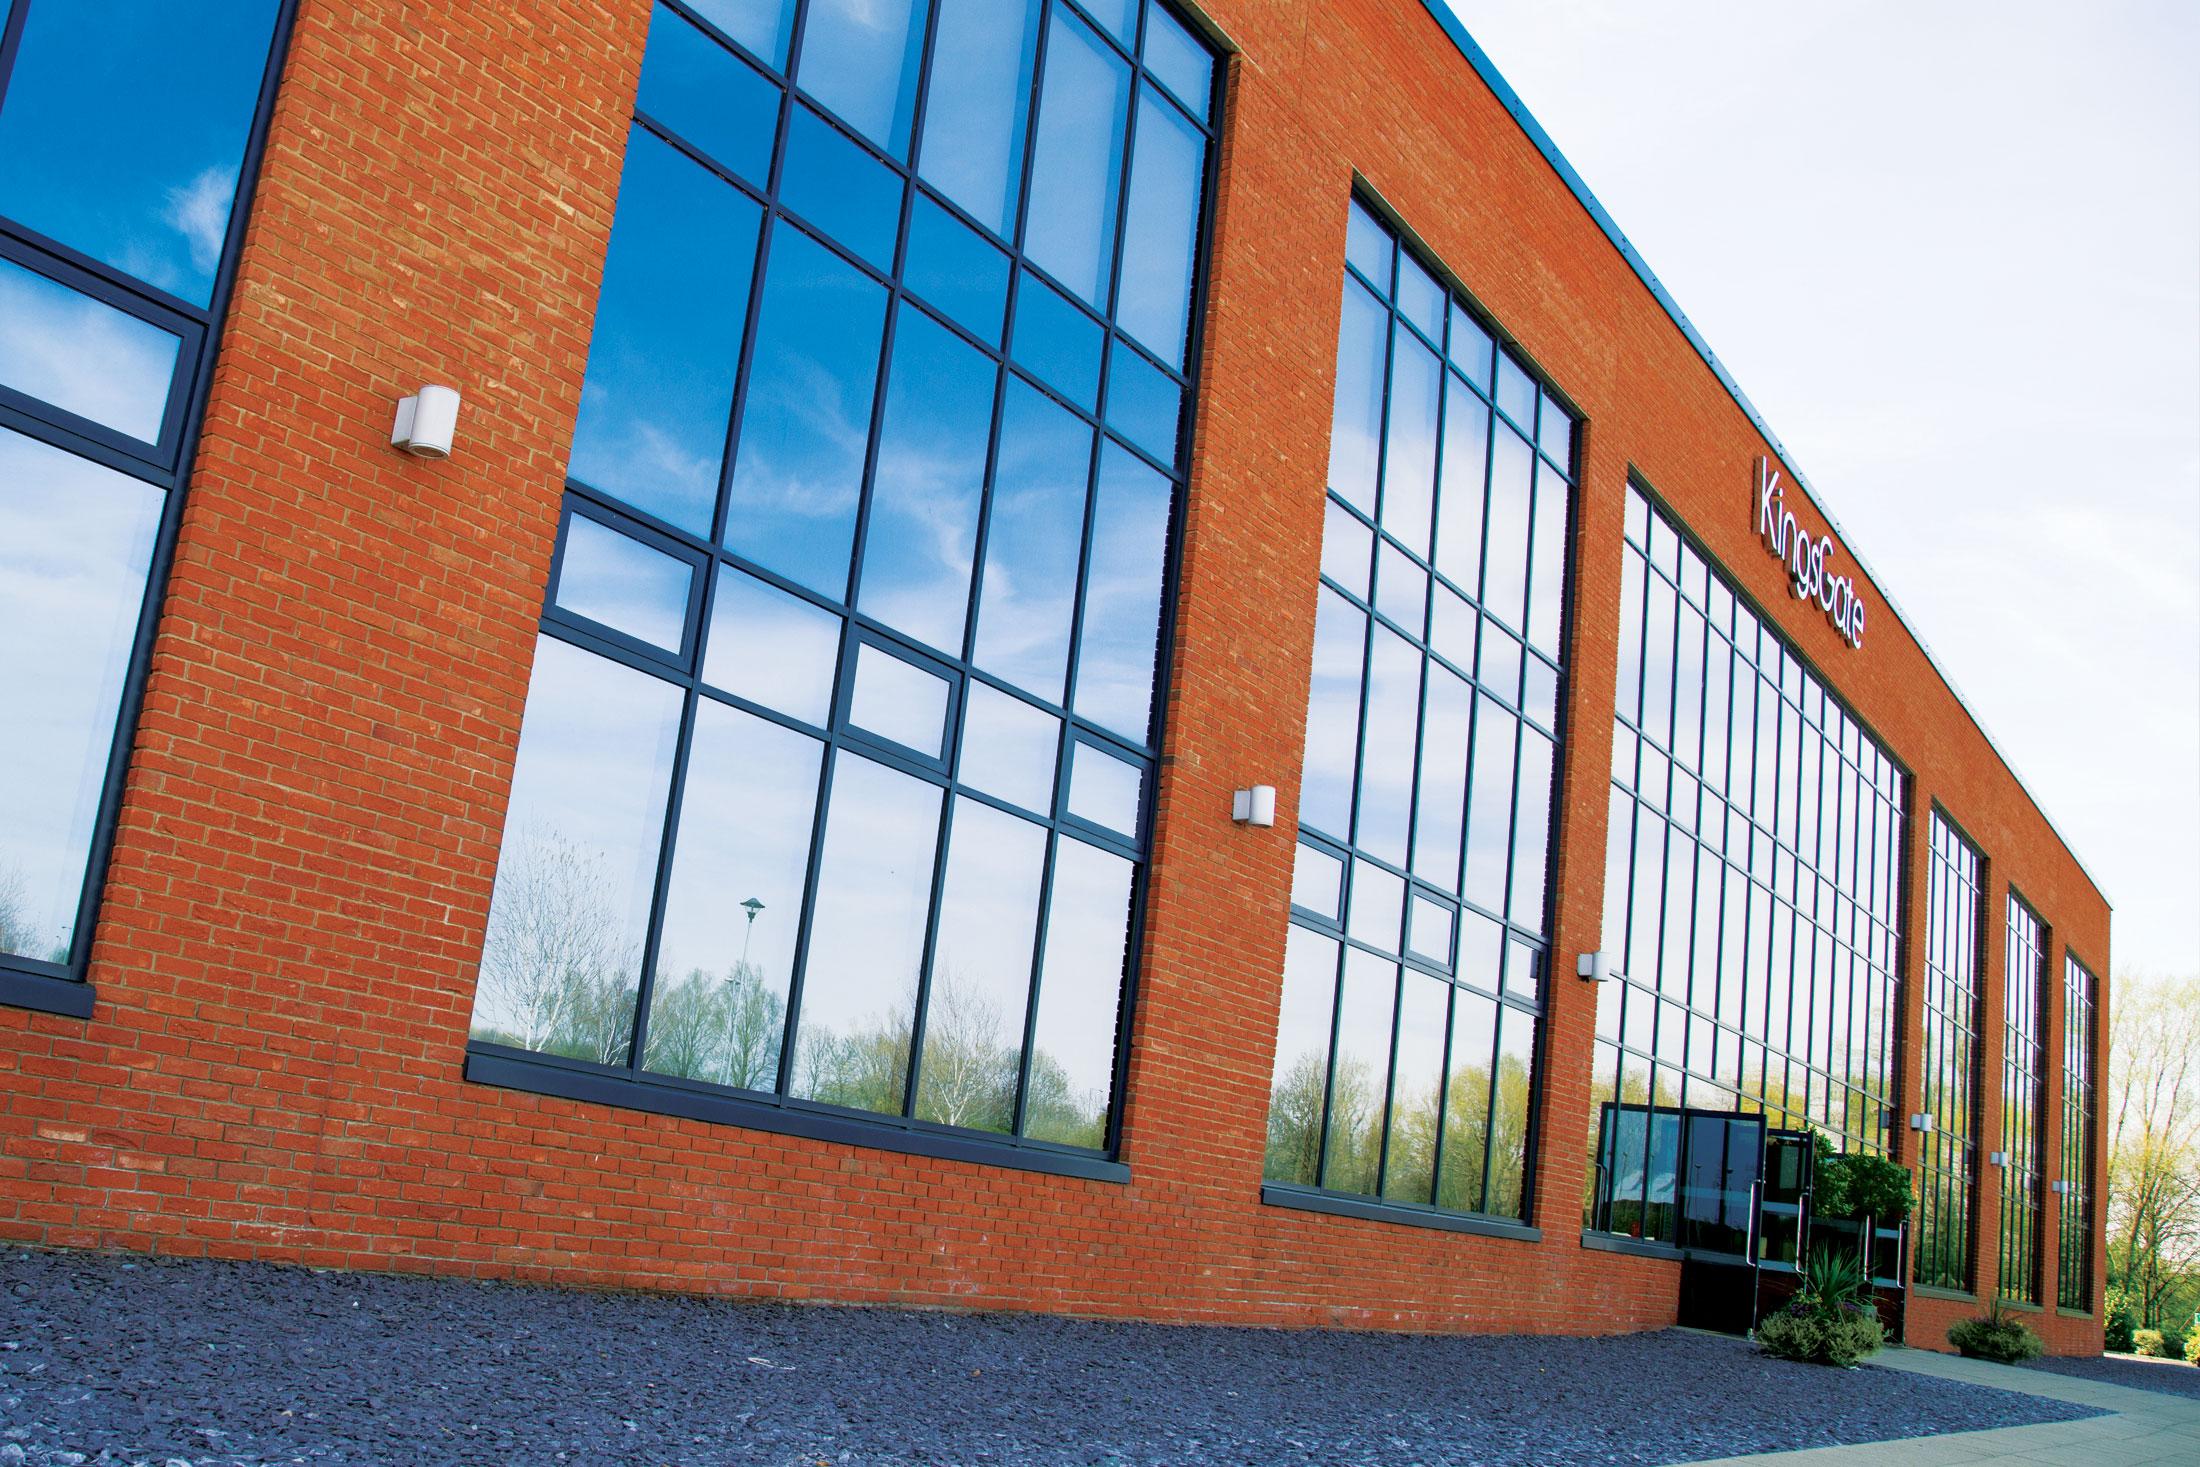 KingsGate Conference Centre